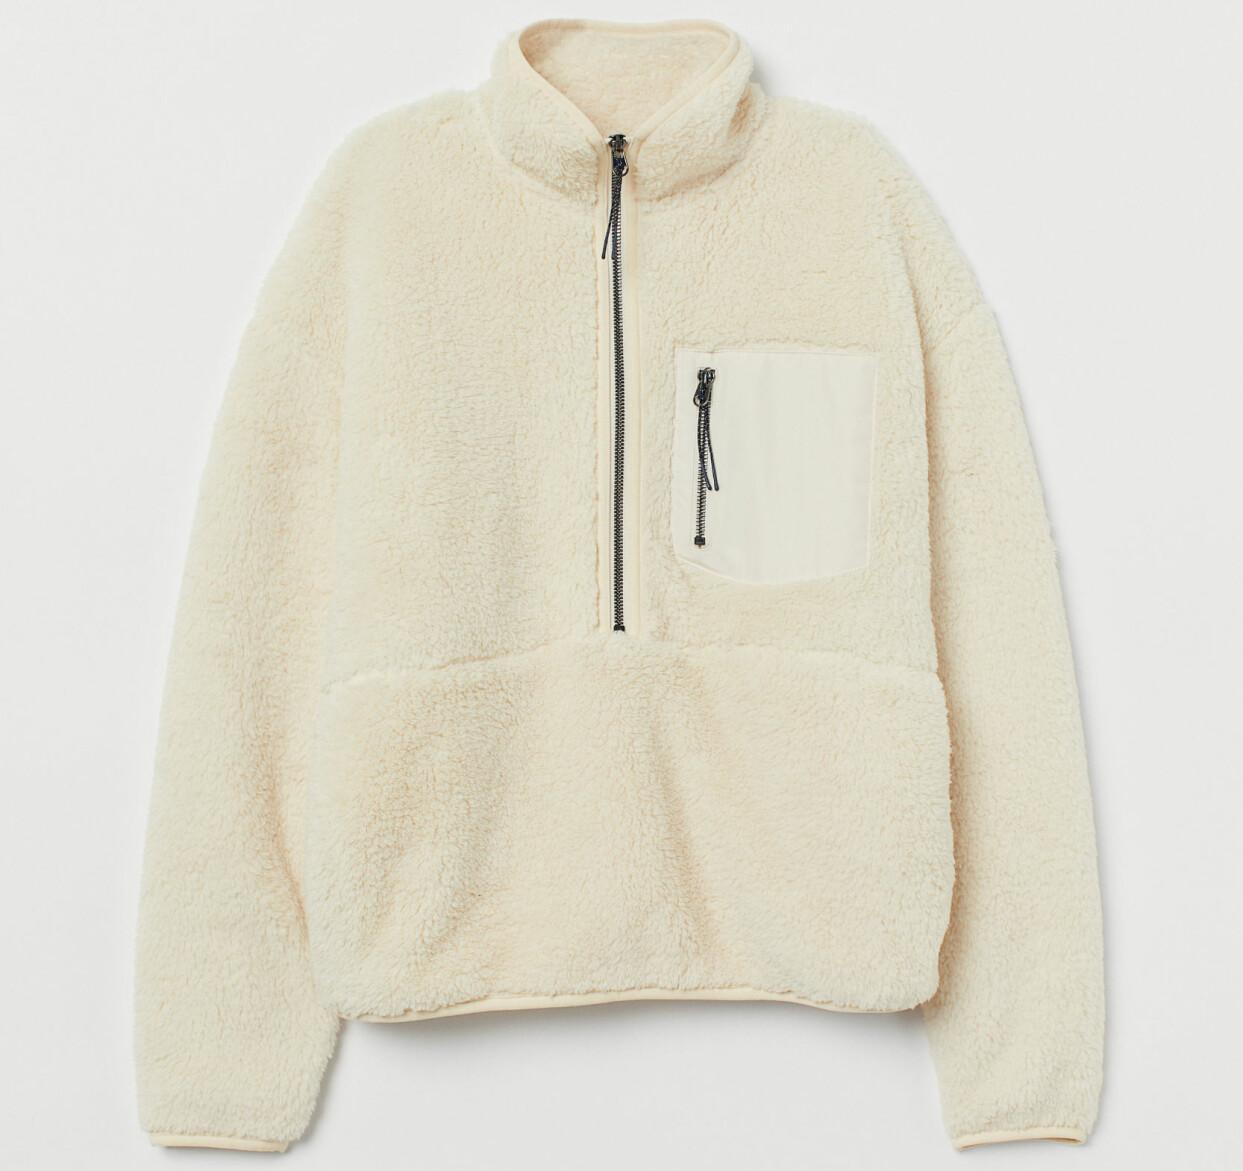 Offwhite jacka pile, från H&M